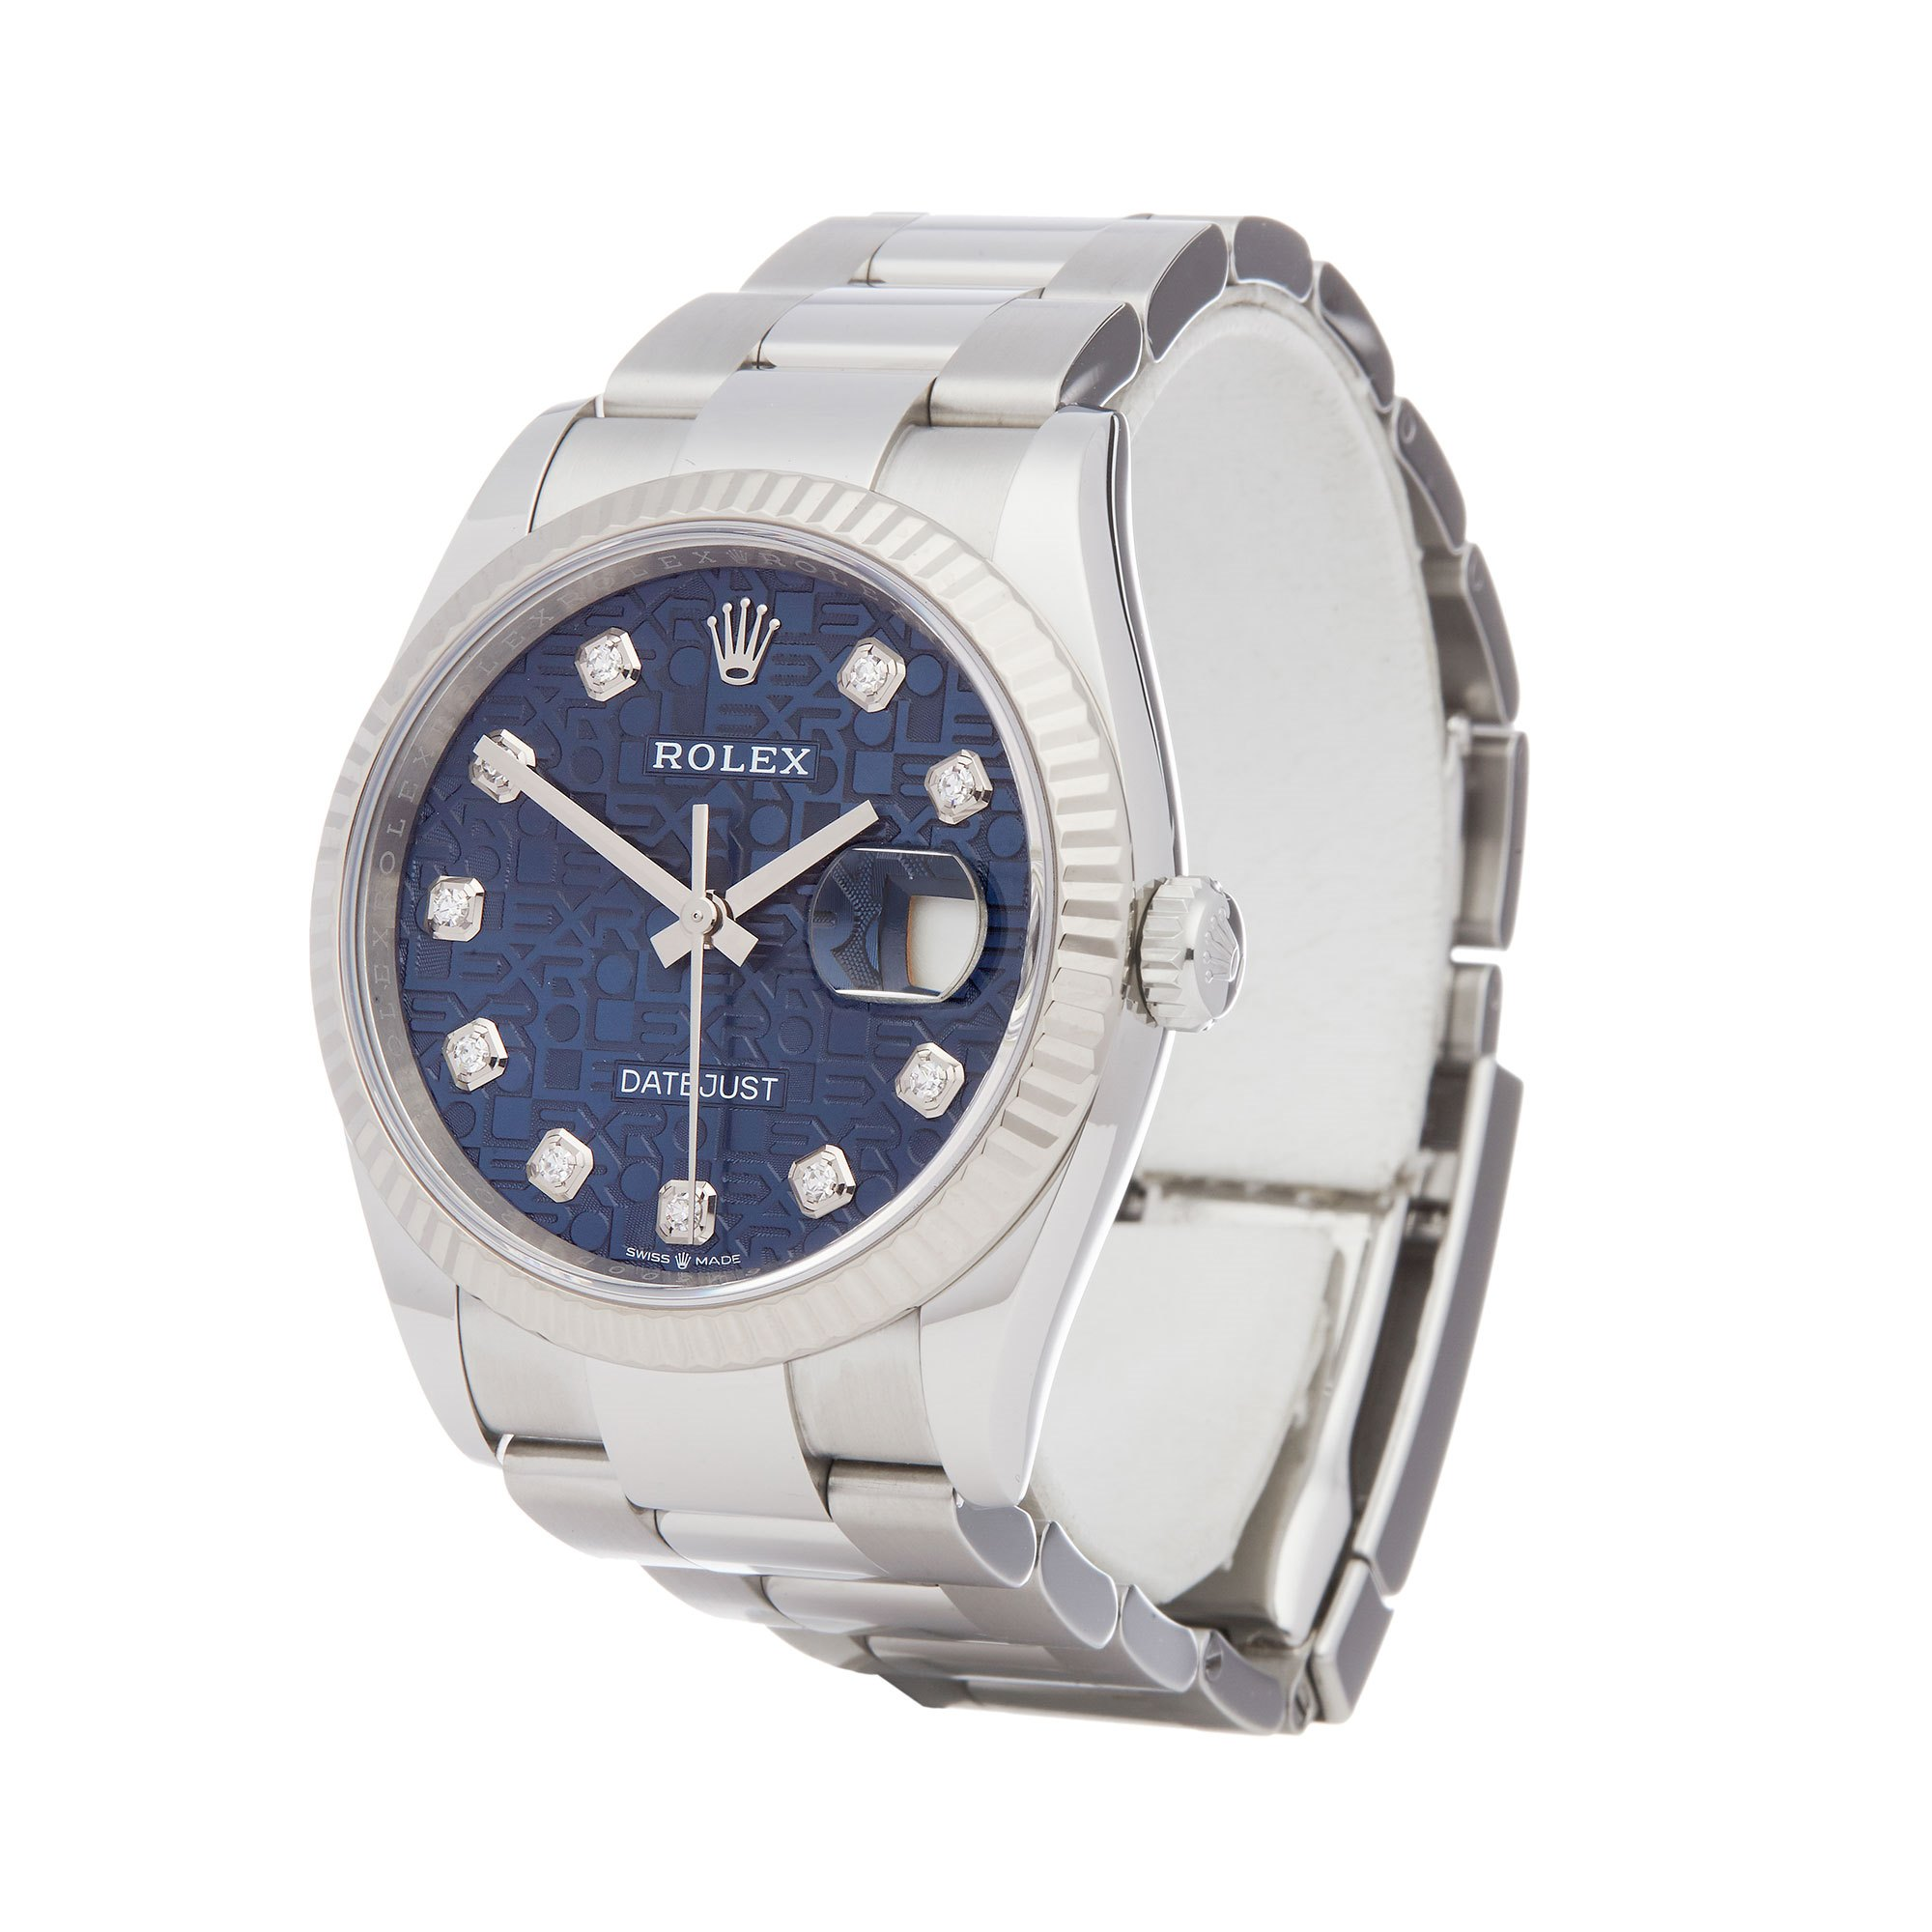 Rolex Datejust 36 18K Stainless Steel 126234